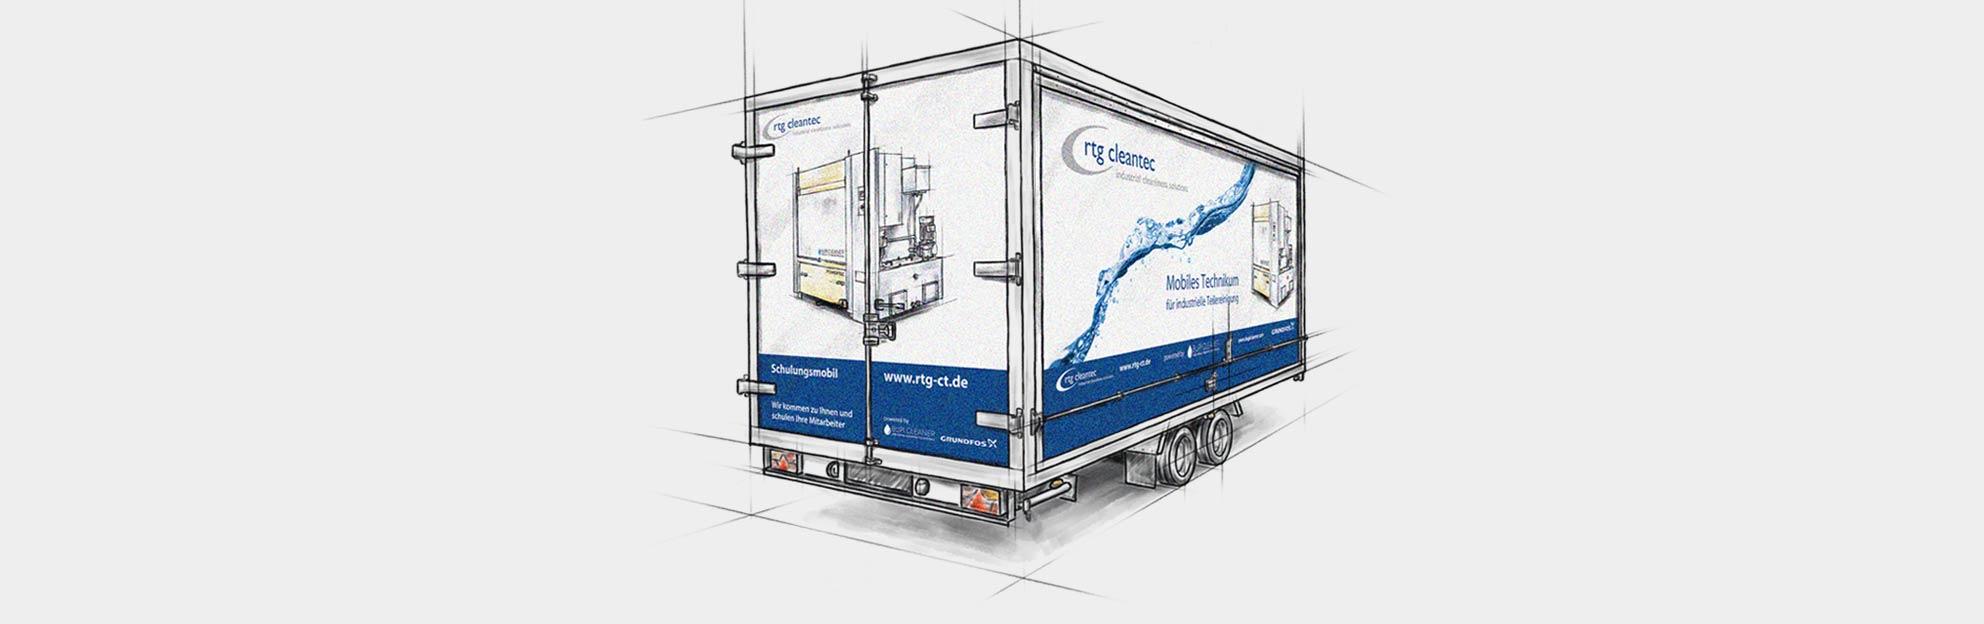 rtg cleantec GmbH